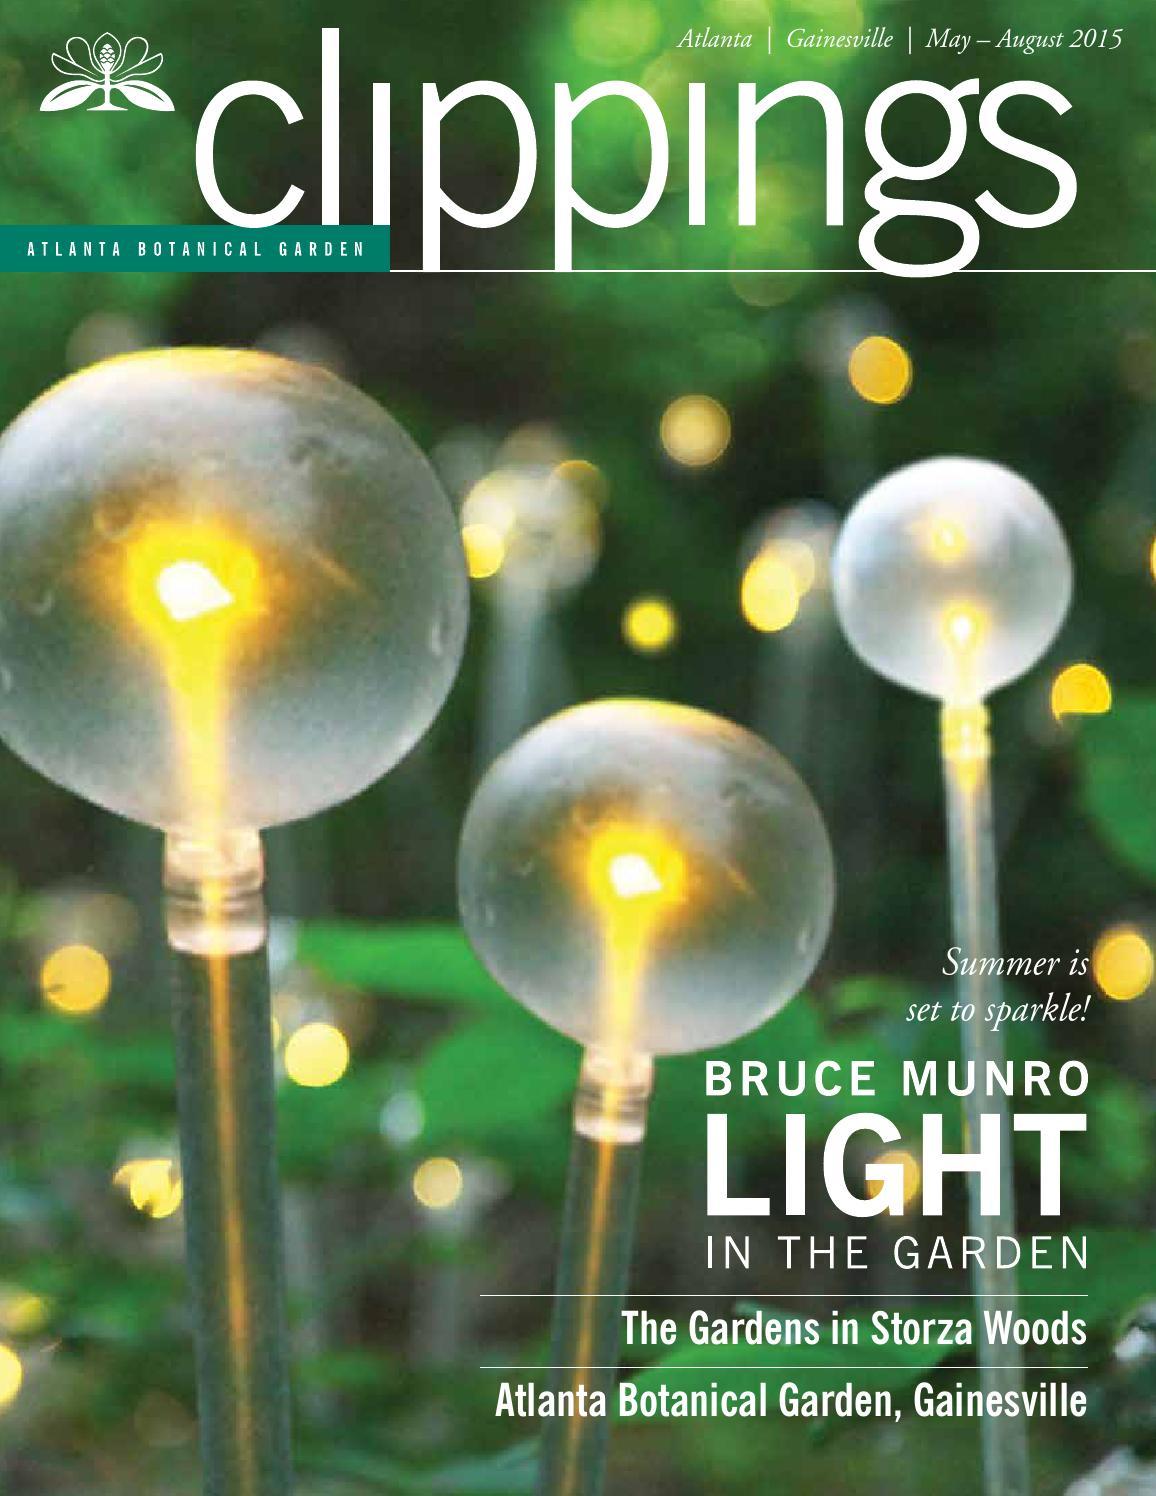 Clippings may aug 2015 by atlanta botanical garden issuu - Botanical gardens gainesville ga ...